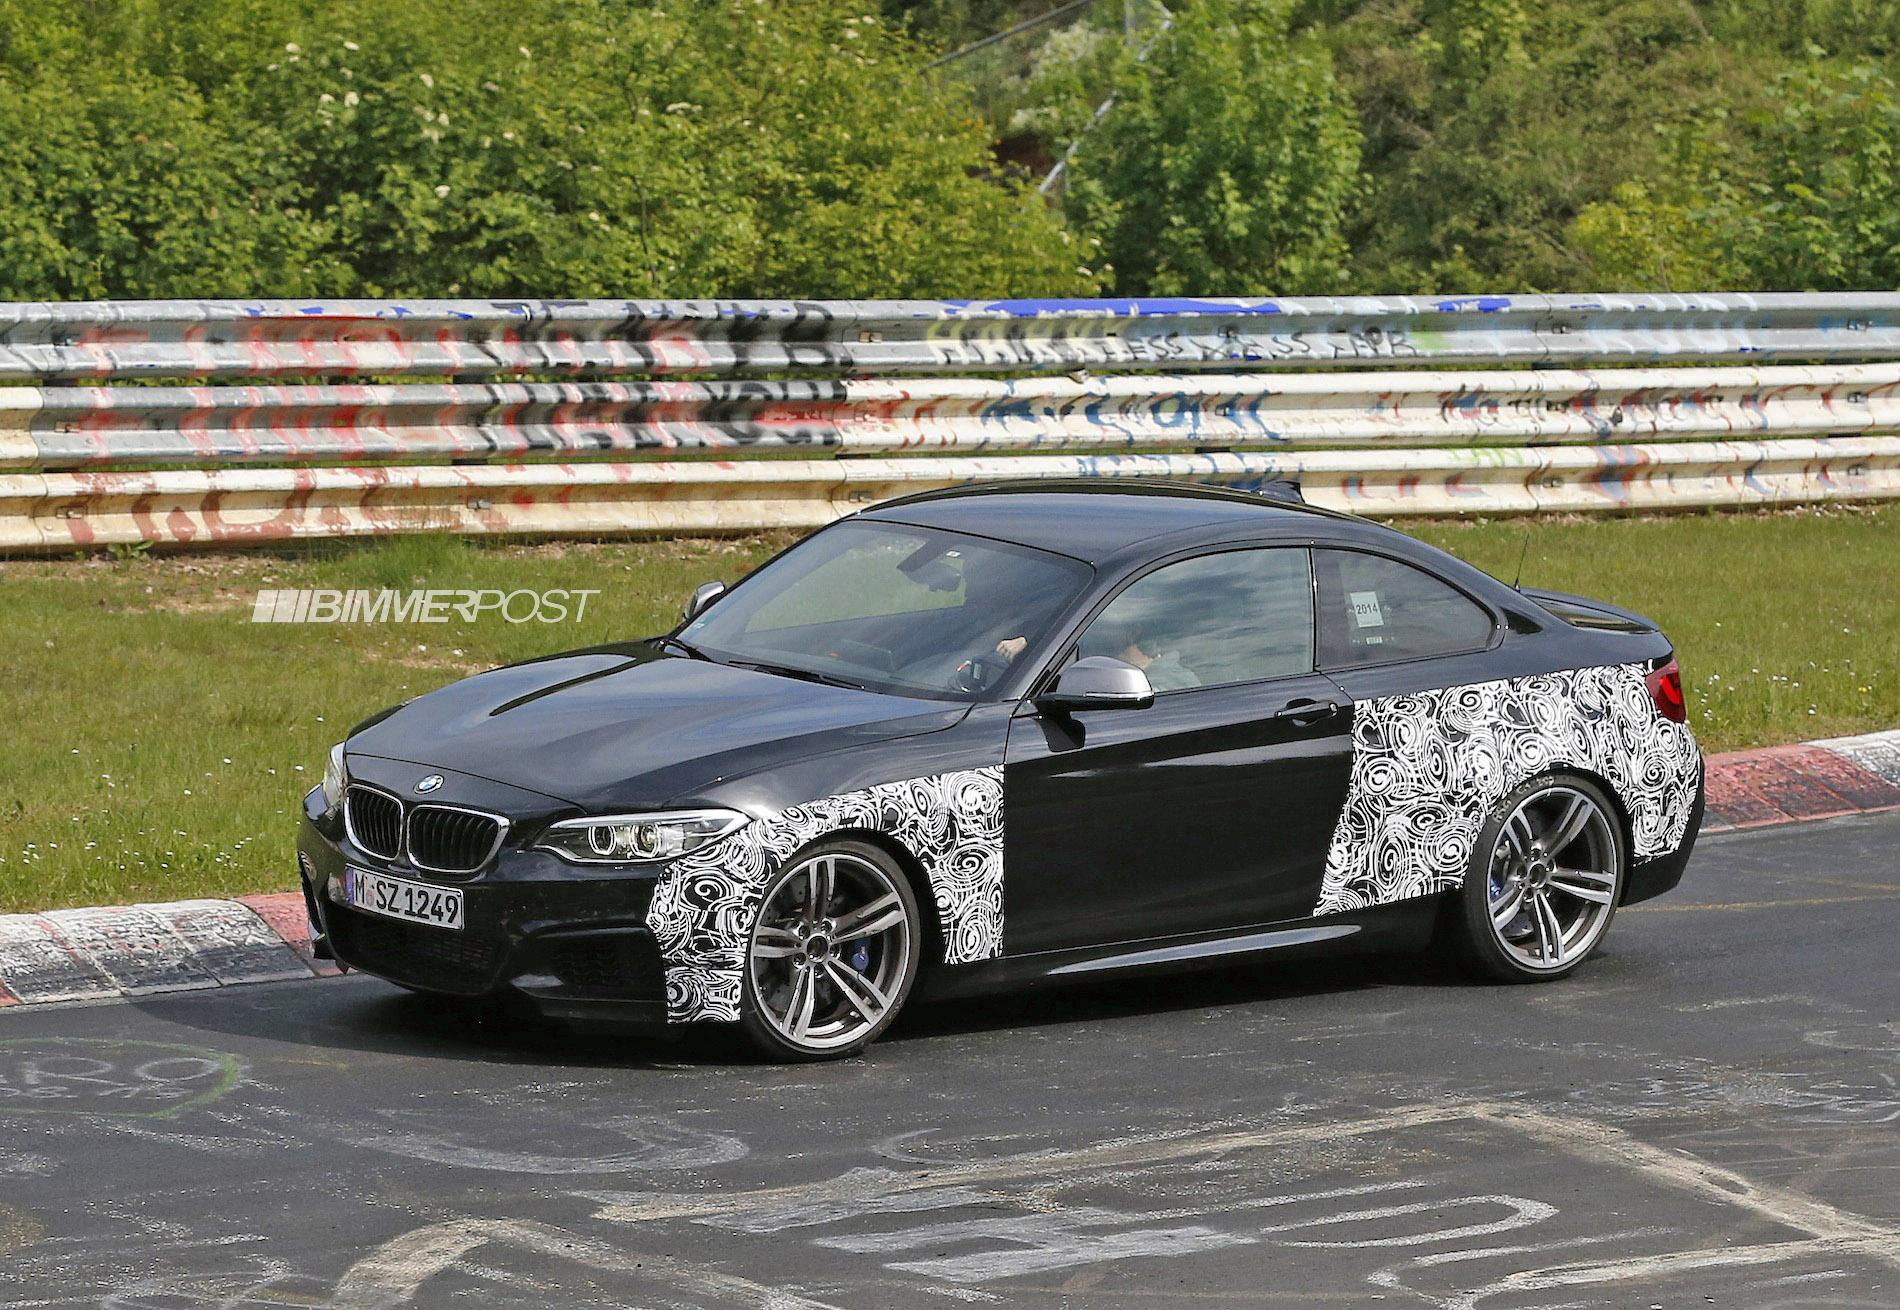 2016 - [BMW] M2 [F87] - Page 3 M2%20Ring%203